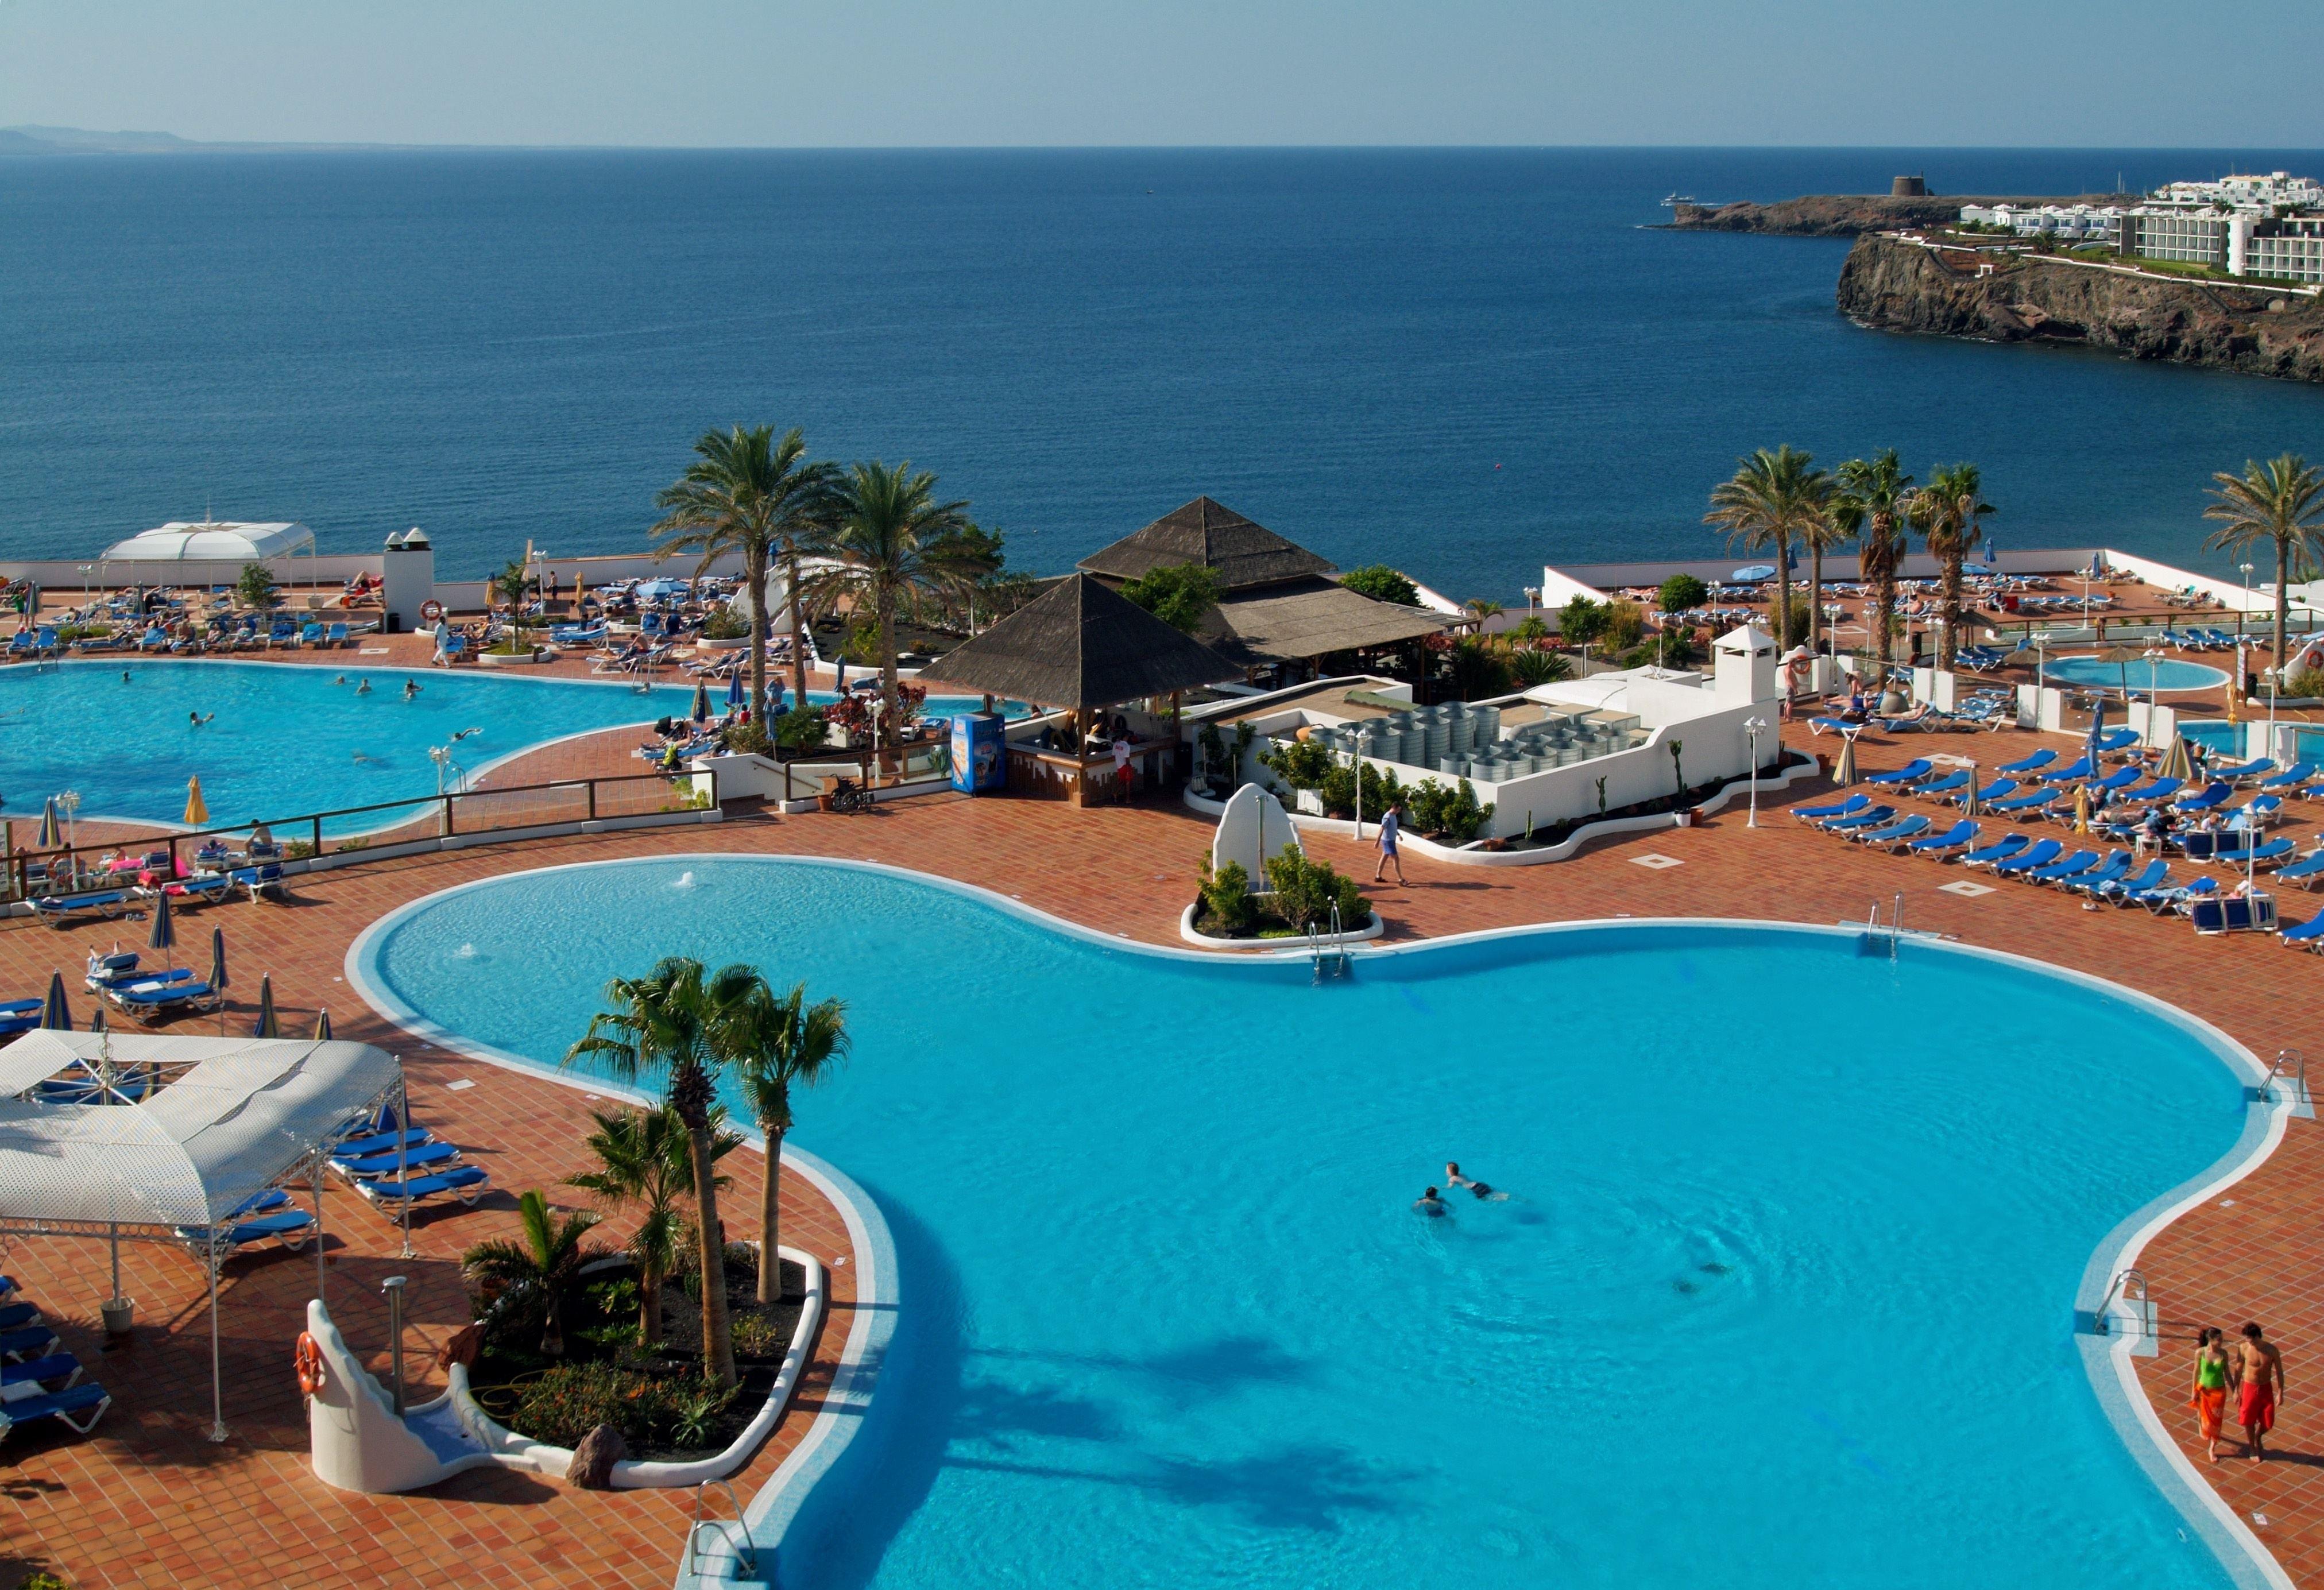 Pool på Hotell Sandos Papagayo Beach Resort, Playa Blanca Lanzarote